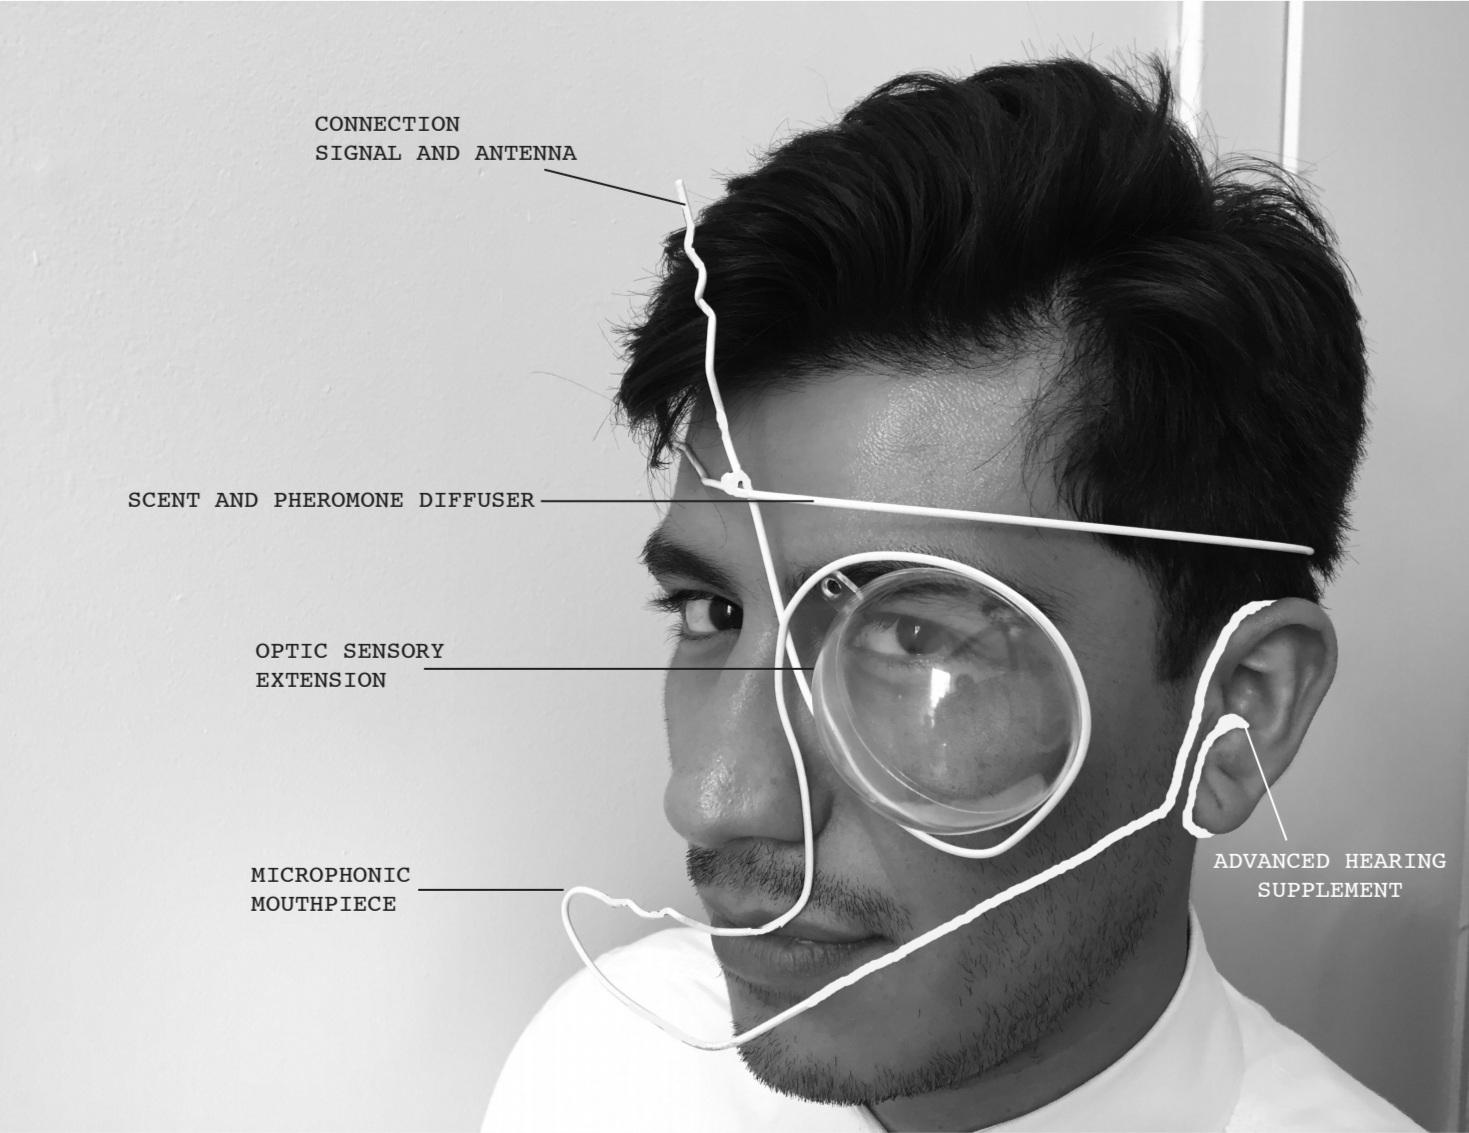 Anthophila Reveries: Speculative Headwear Prototype